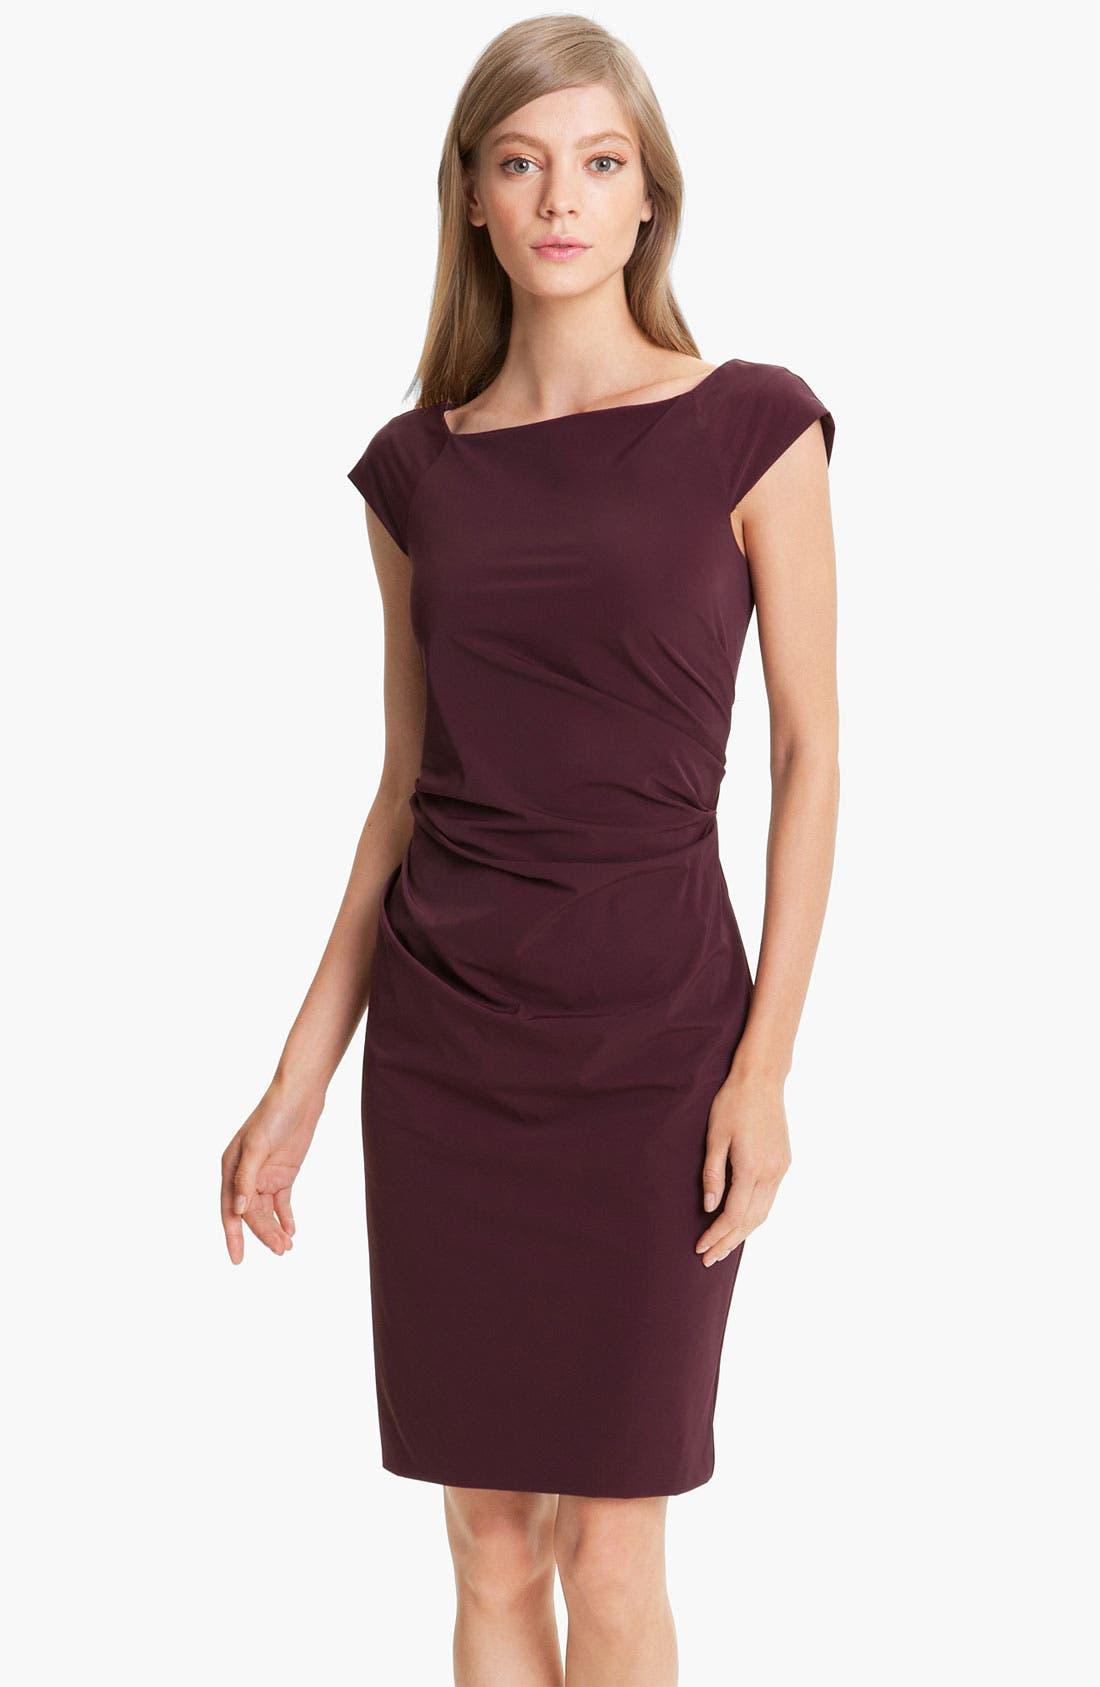 Alternate Image 1 Selected - Diane von Furstenberg 'Gaby' Sheath Dress